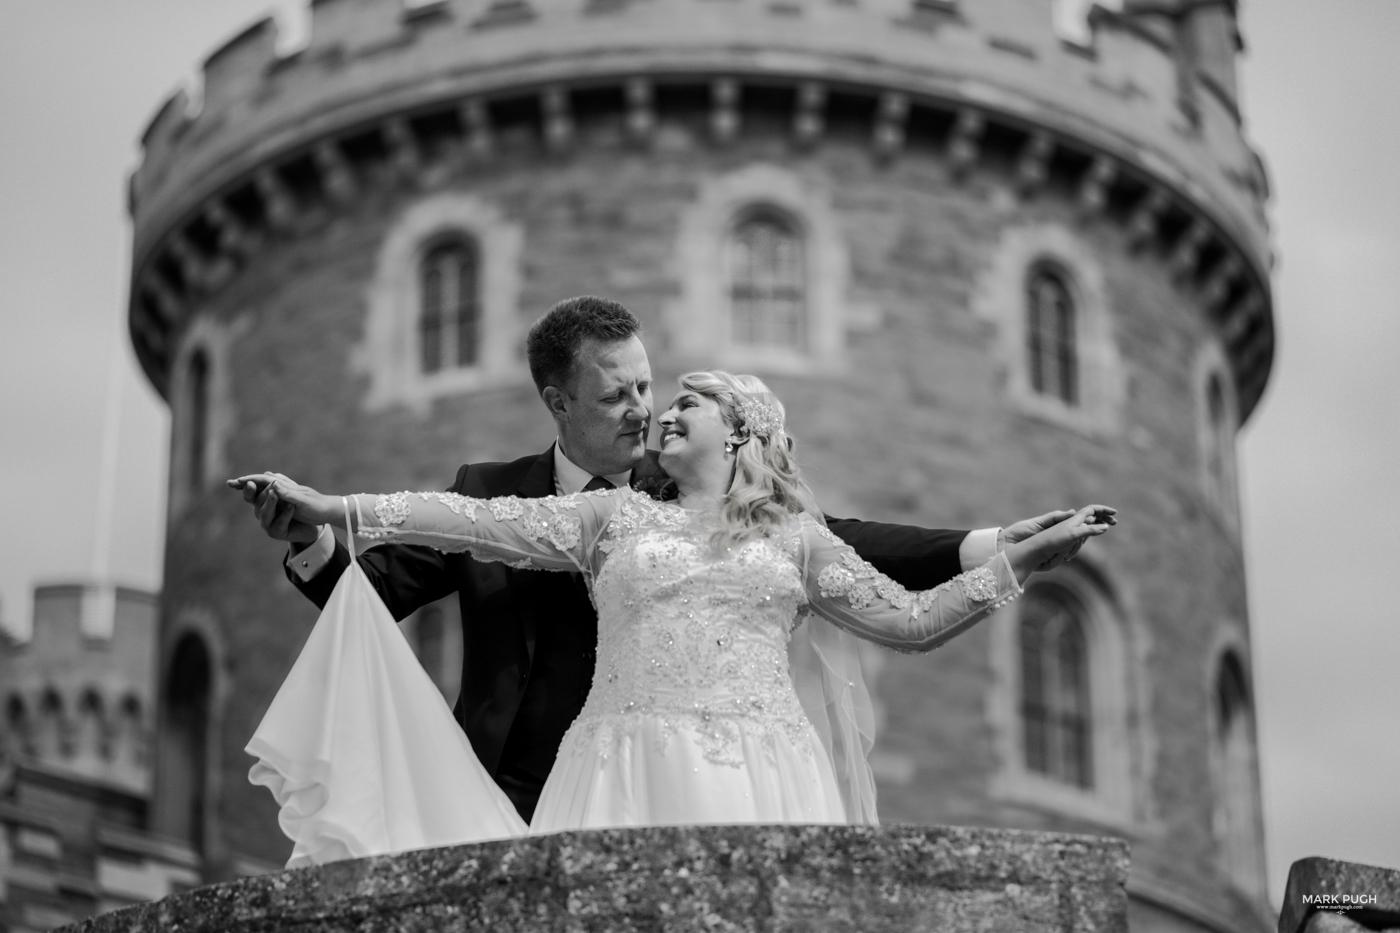 168 Wedding Photography Award winning Wedding Photographer and Videographer Mark Pugh www.markpugh.com.JPG